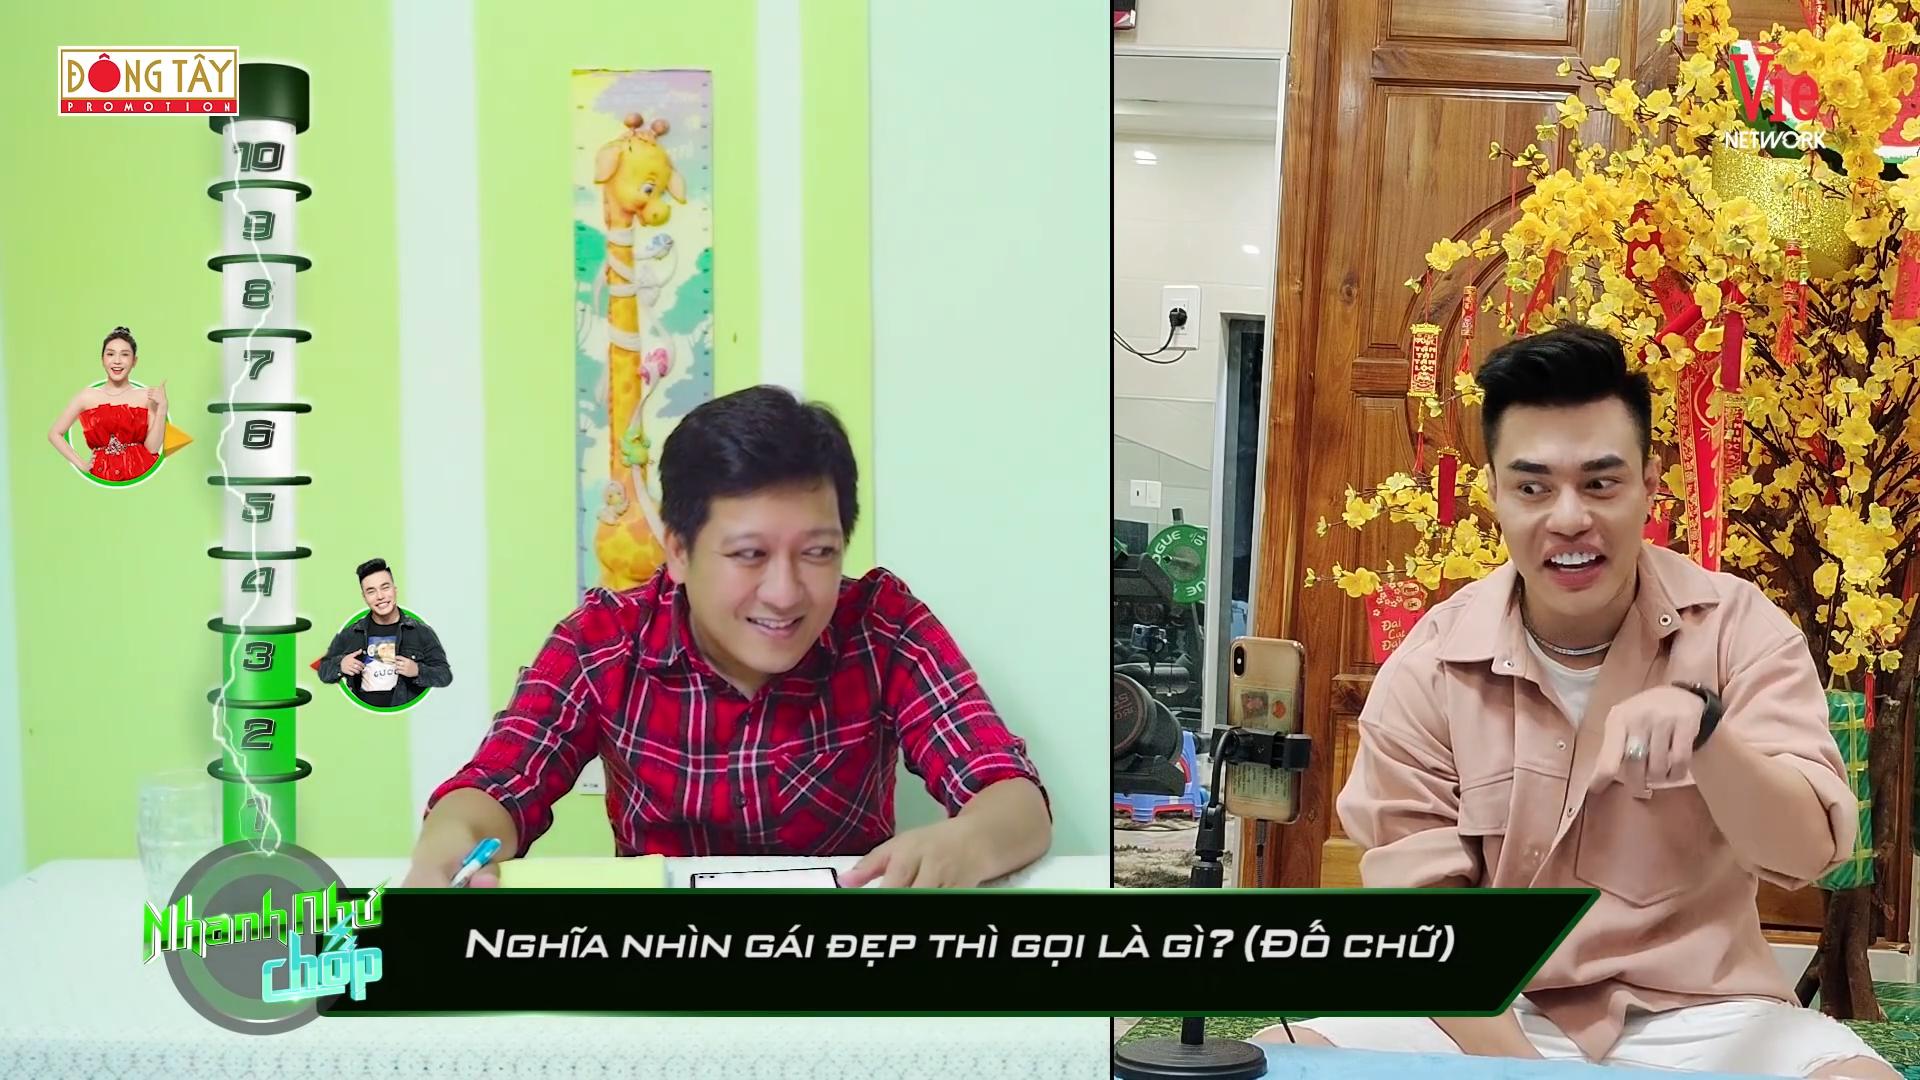 Nhanh-Nhu-Chop-3